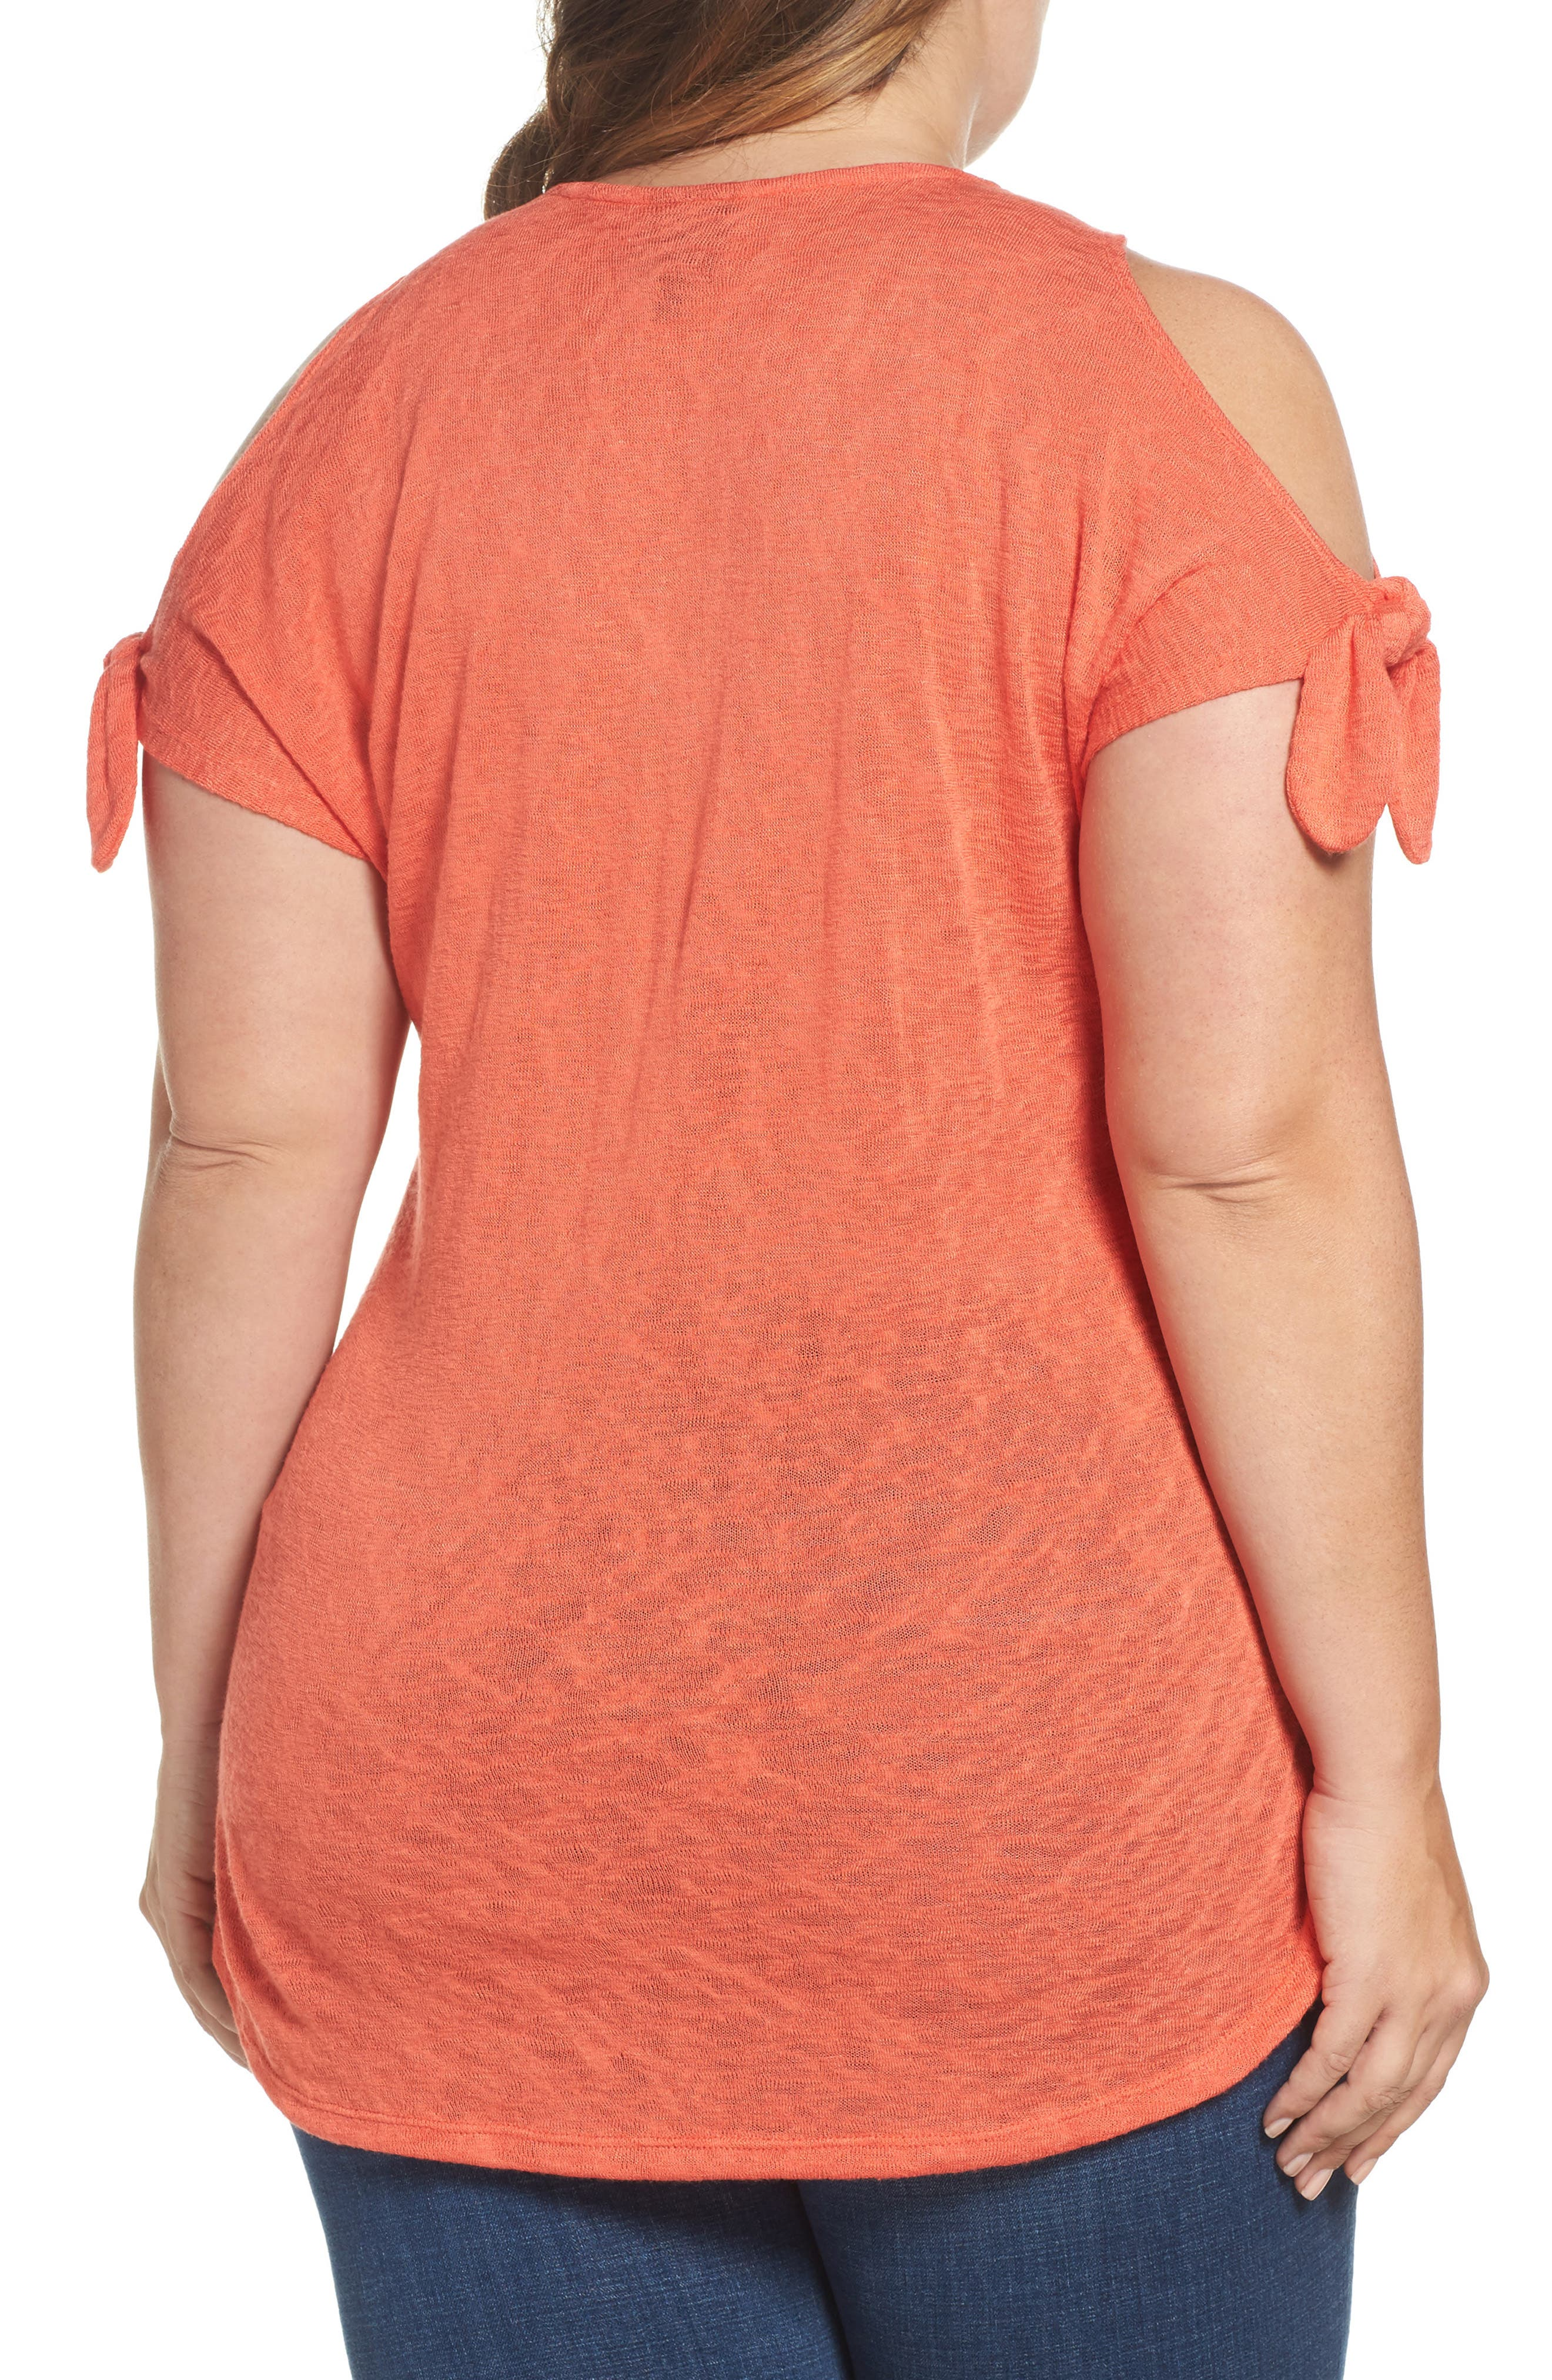 Tassel Trim Slub Knit Top,                             Alternate thumbnail 2, color,                             Orange